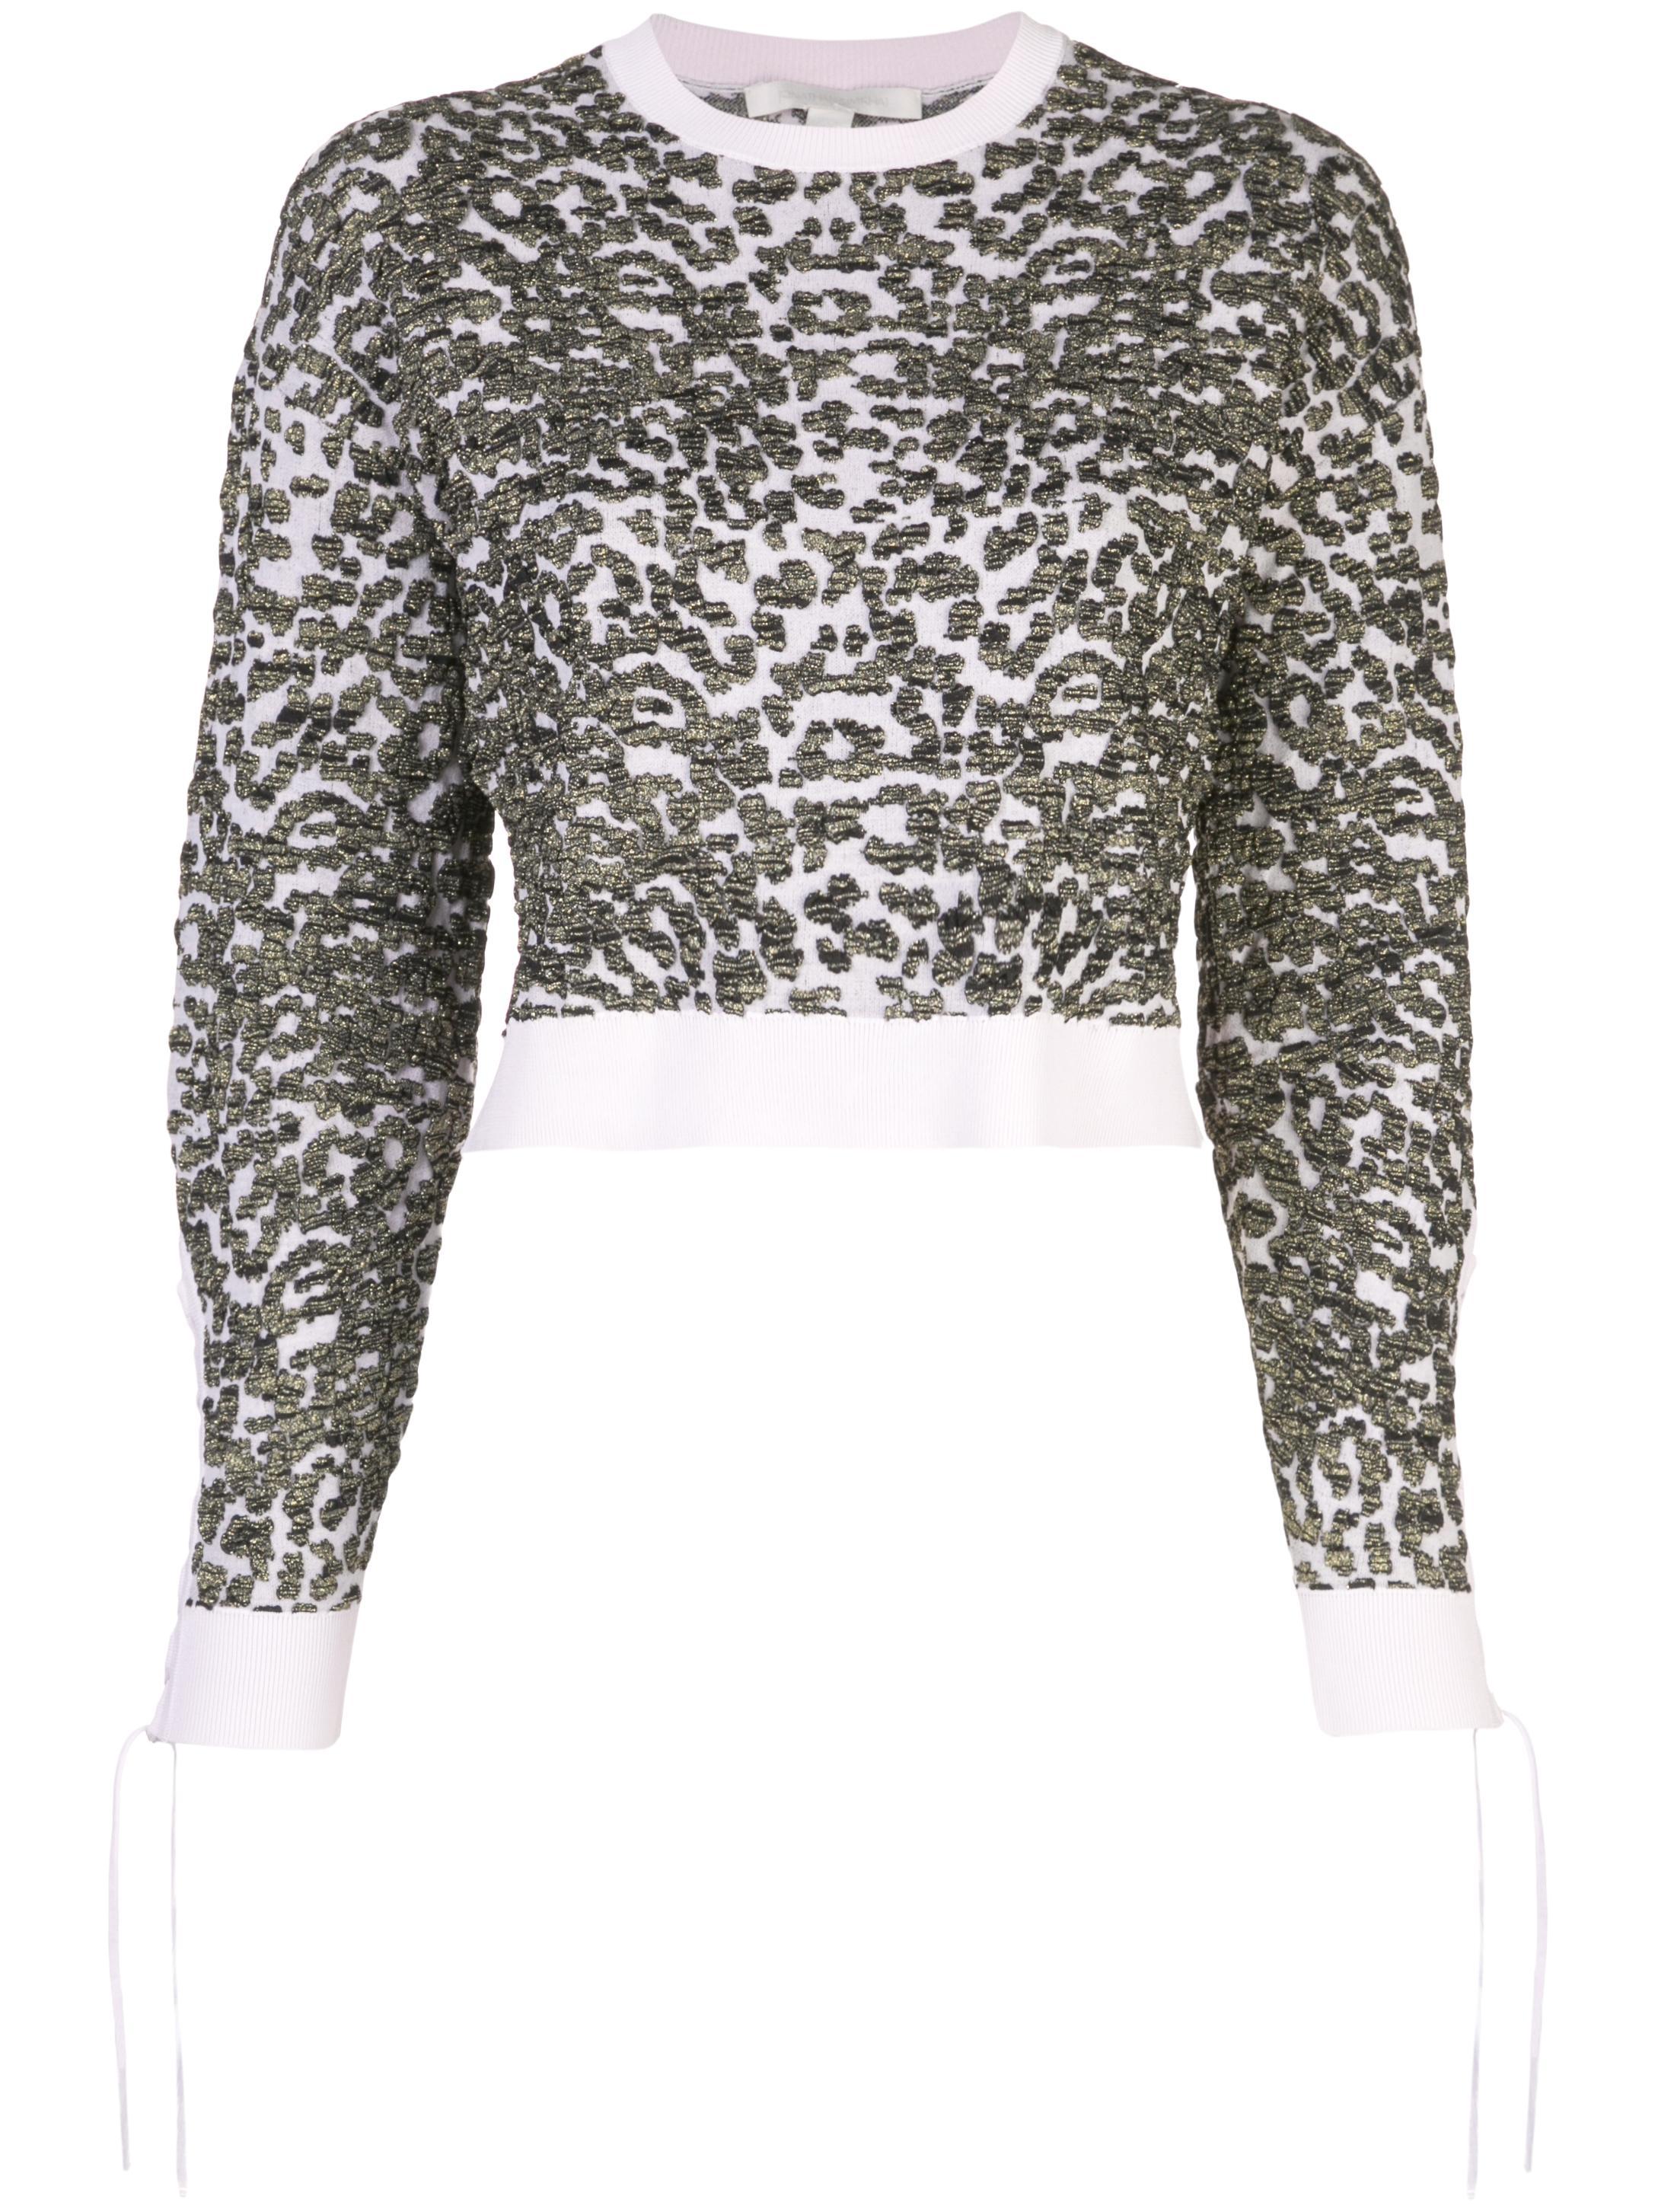 Long Sleeve Leopard Jacquard Crew Neck Sweater